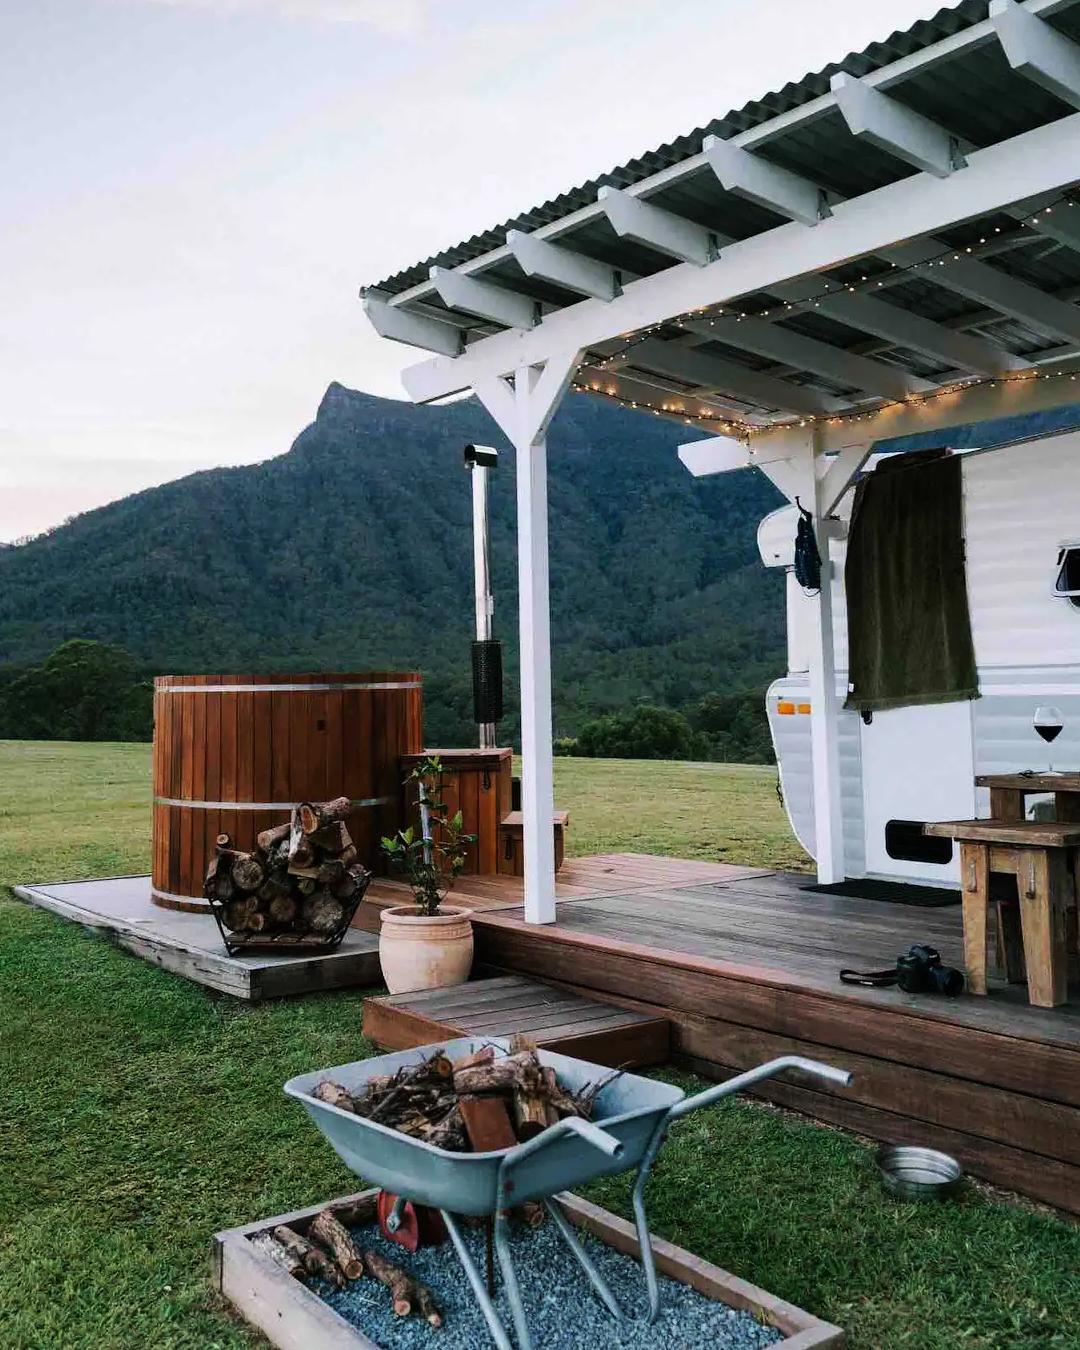 caravan with outdoor tub